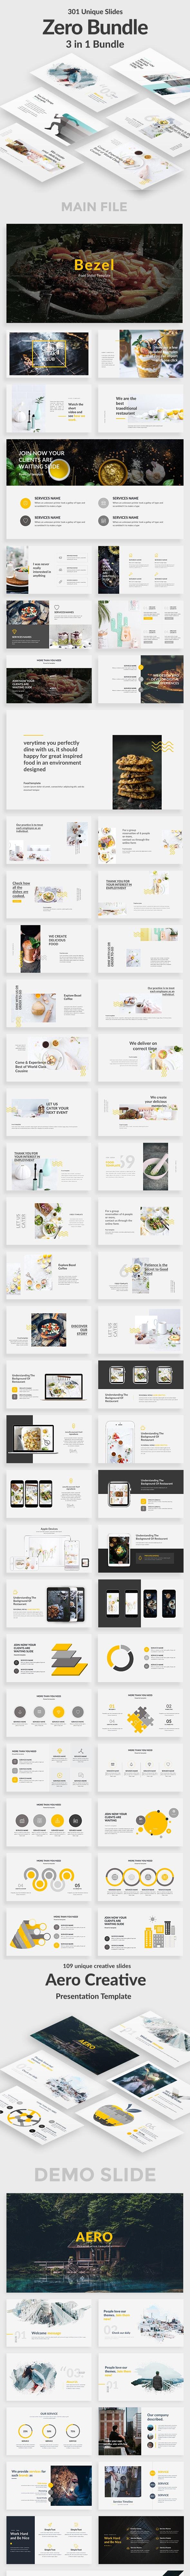 3 in 1 Zero Bundle Creative Powerpoint Template - Creative PowerPoint Templates